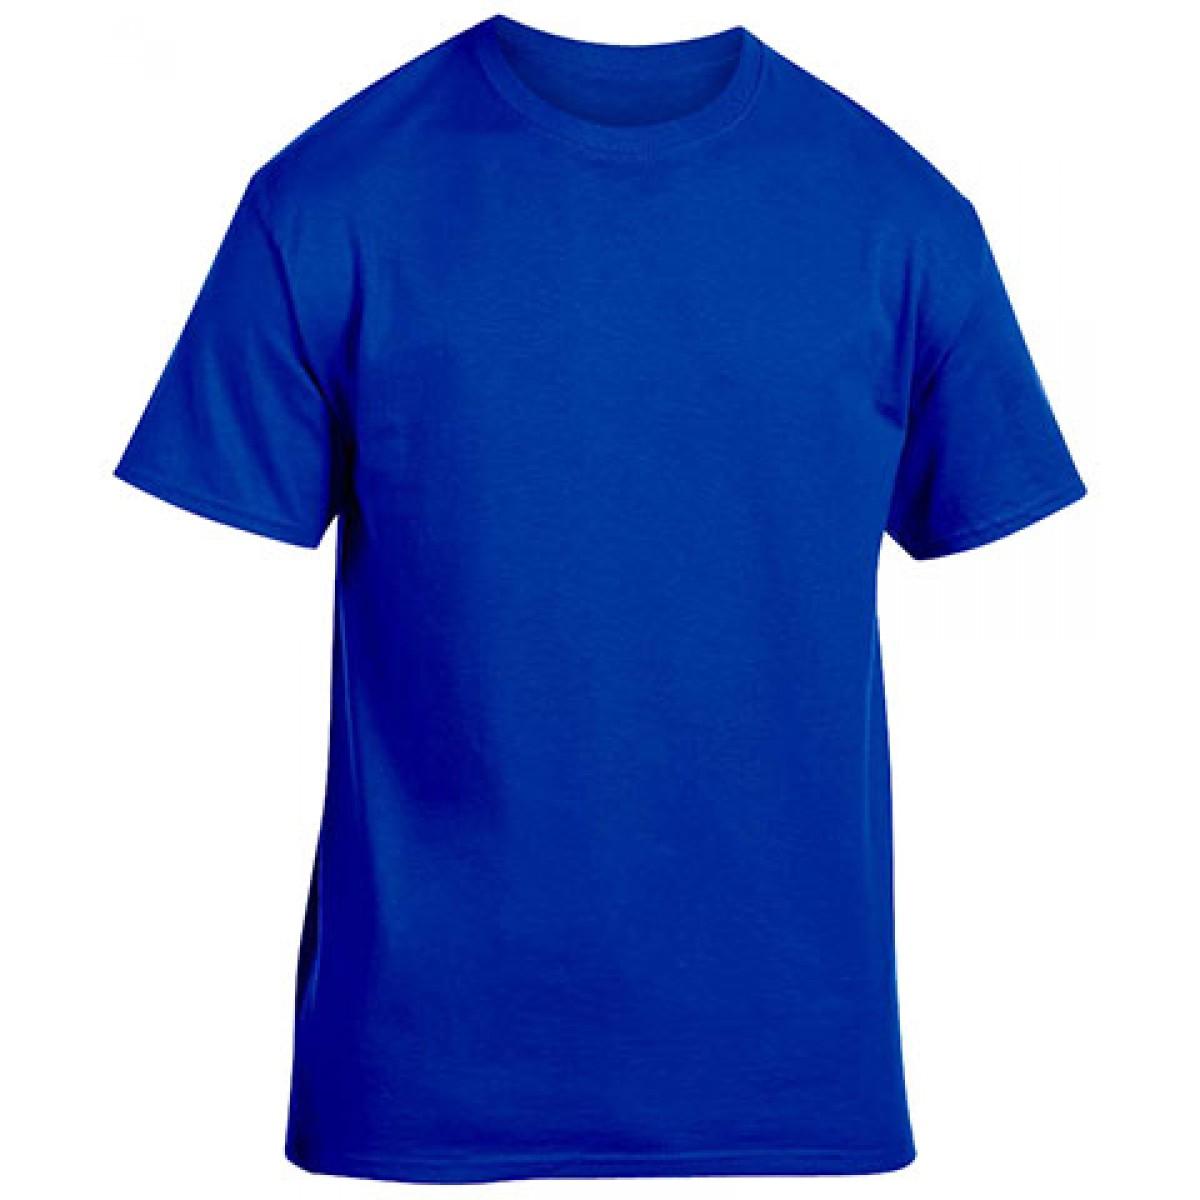 Heavy Cotton Activewear T-Shirt-Navy-L